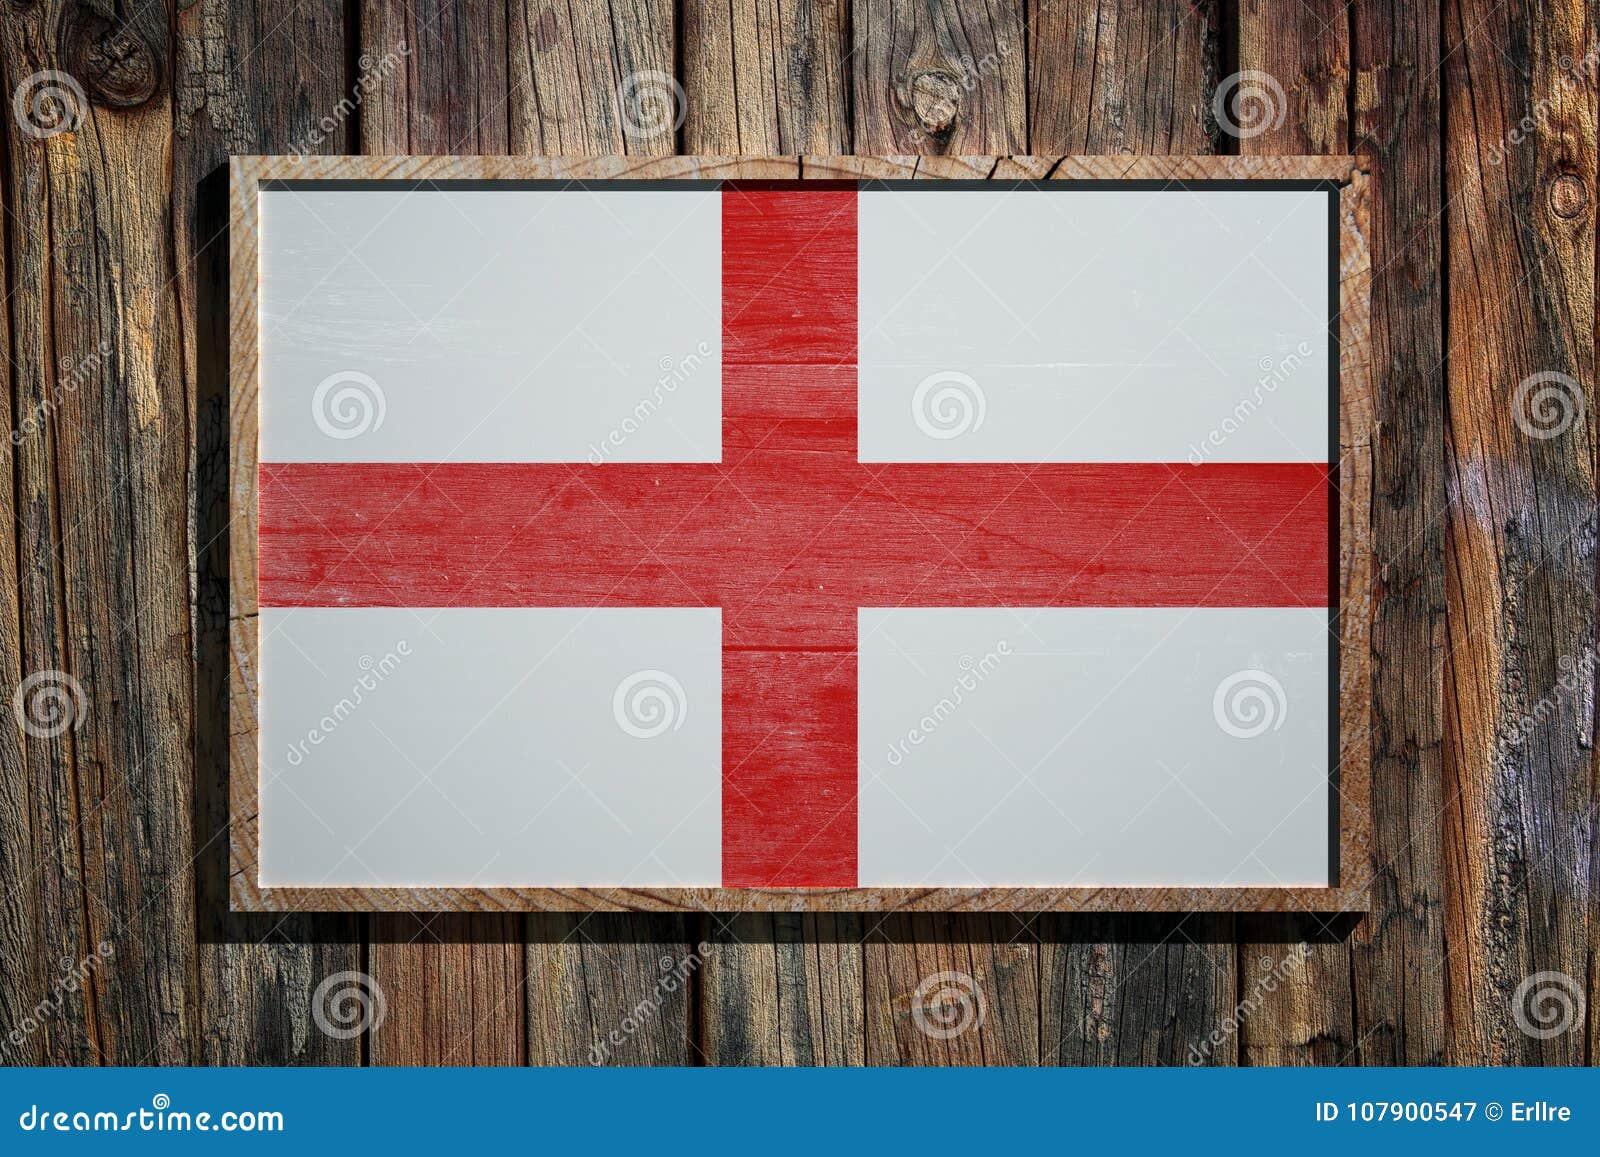 Wooden England flag stock illustration. Illustration of wood - 107900547